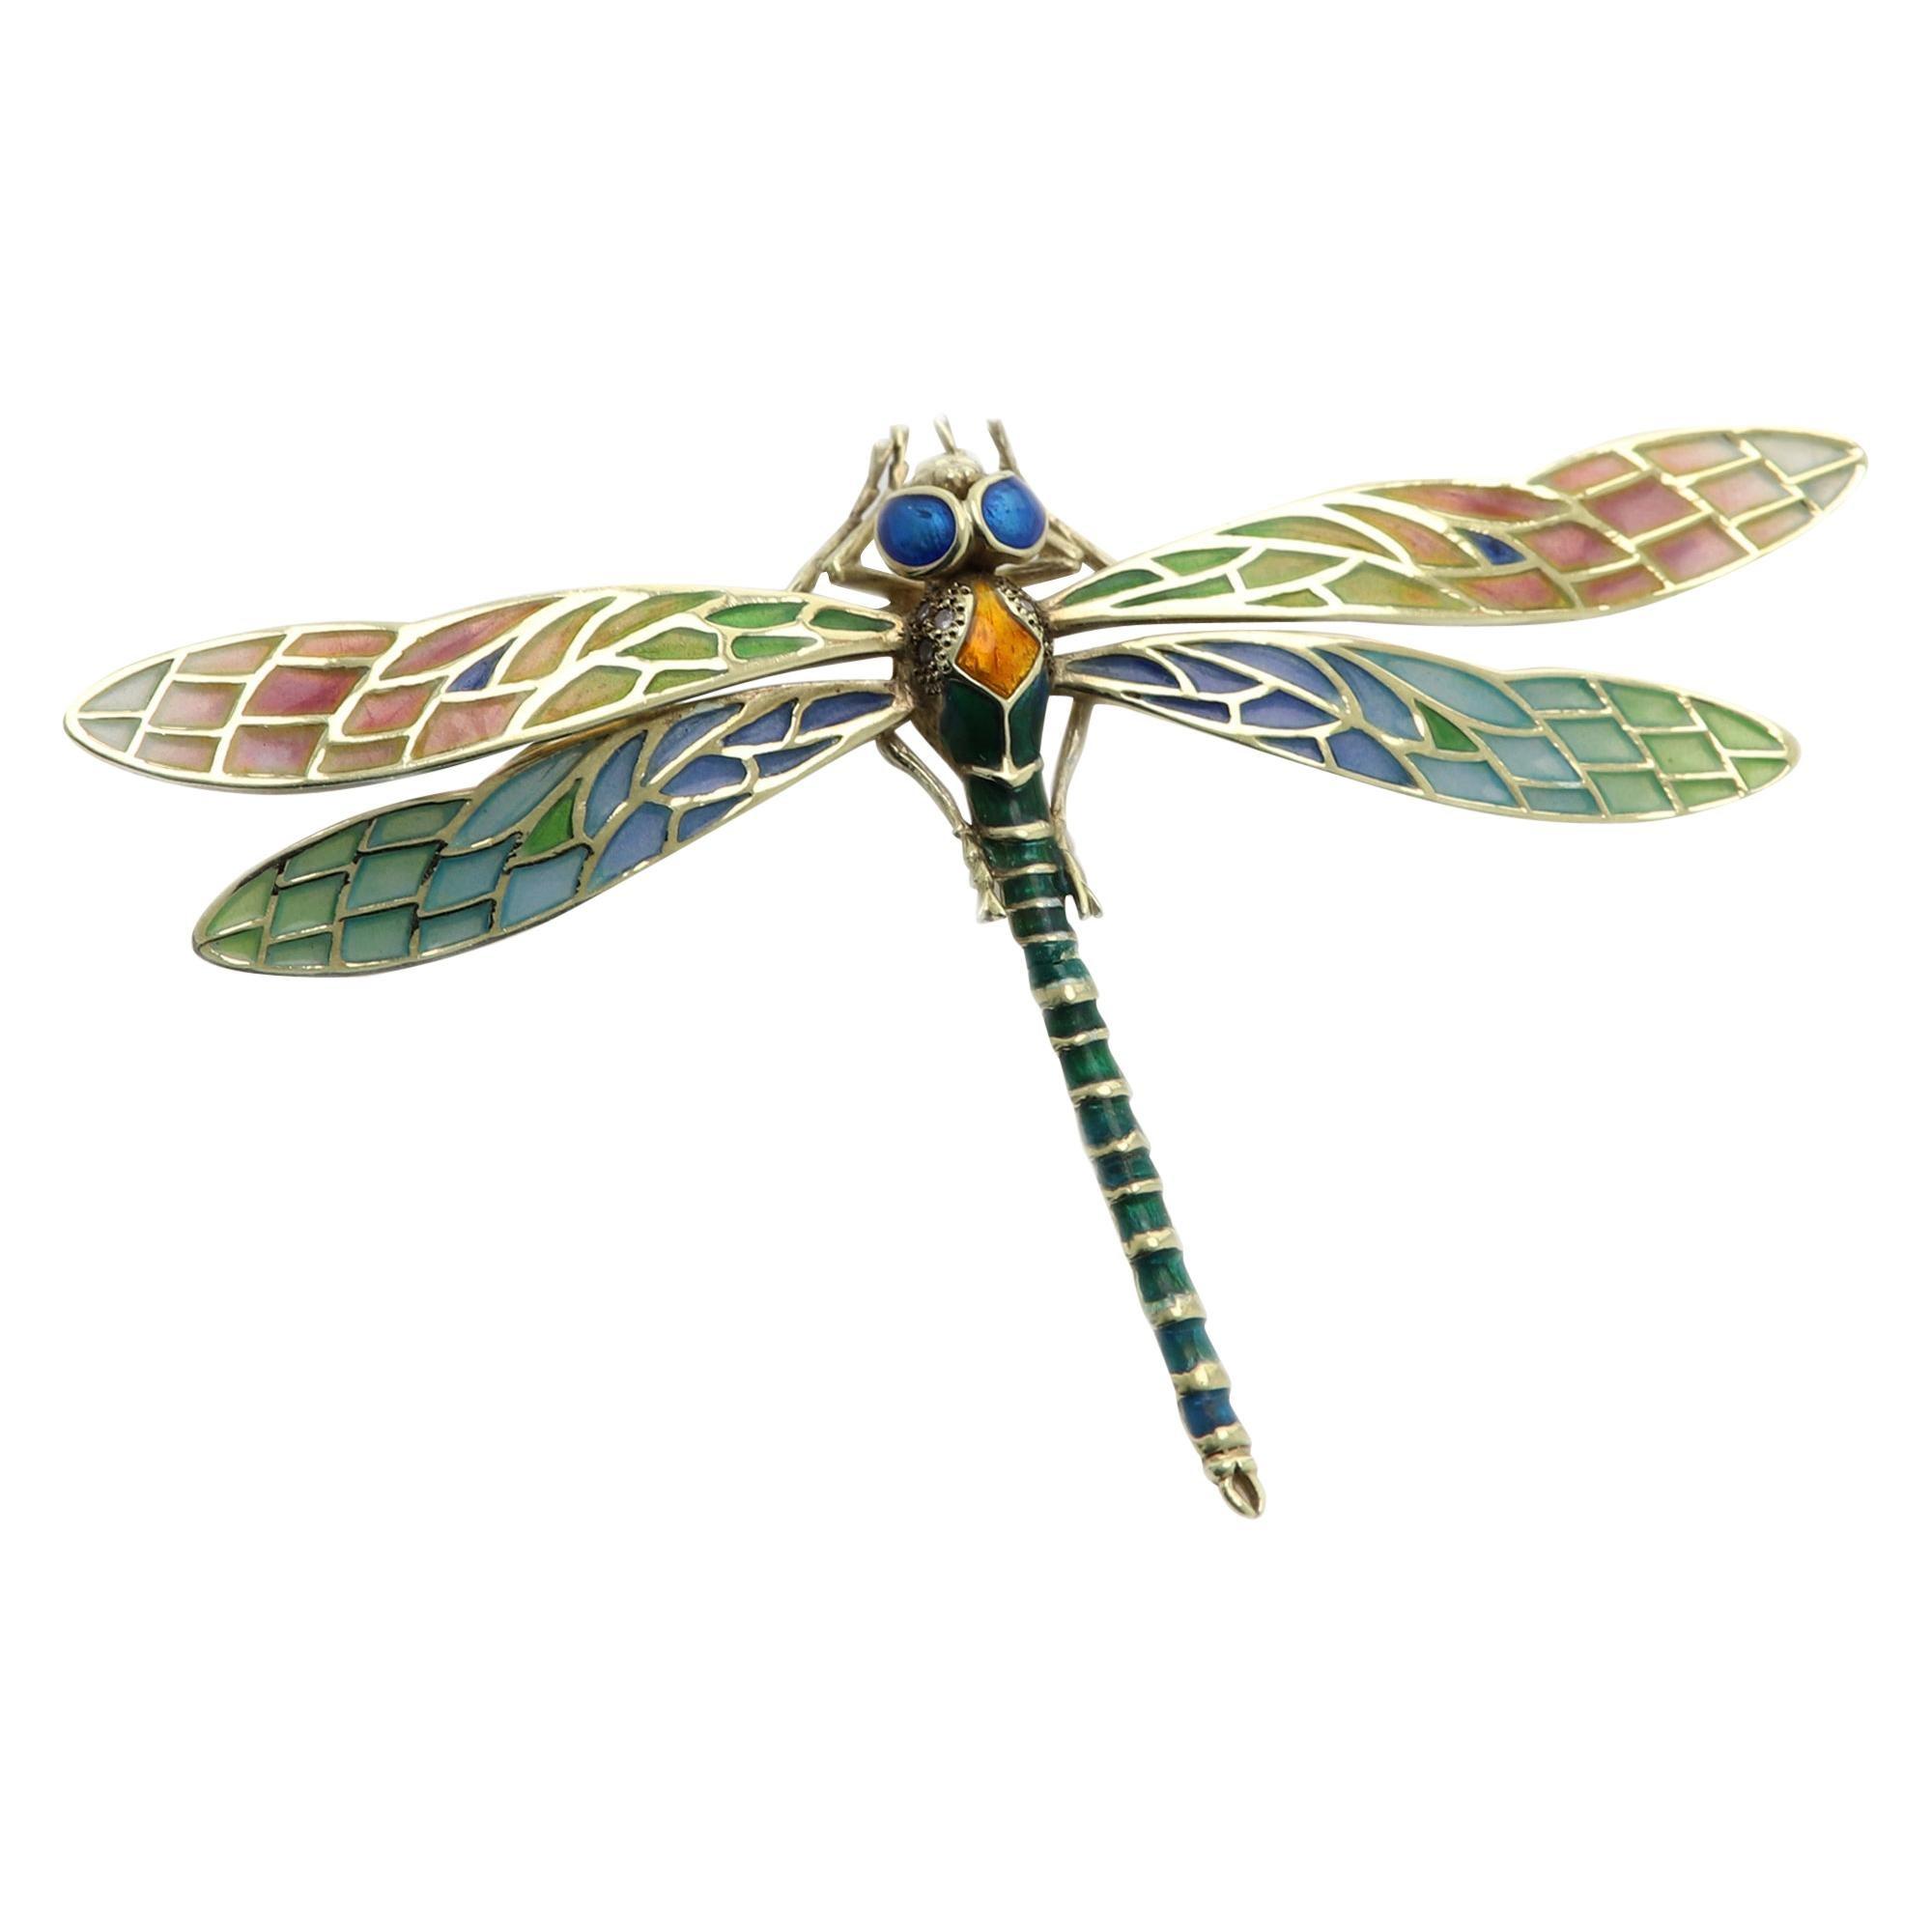 Dragonfly Brooch Pin Enamel 14 Karat Yellow Gold / Necklace Enamel Pin Brooch